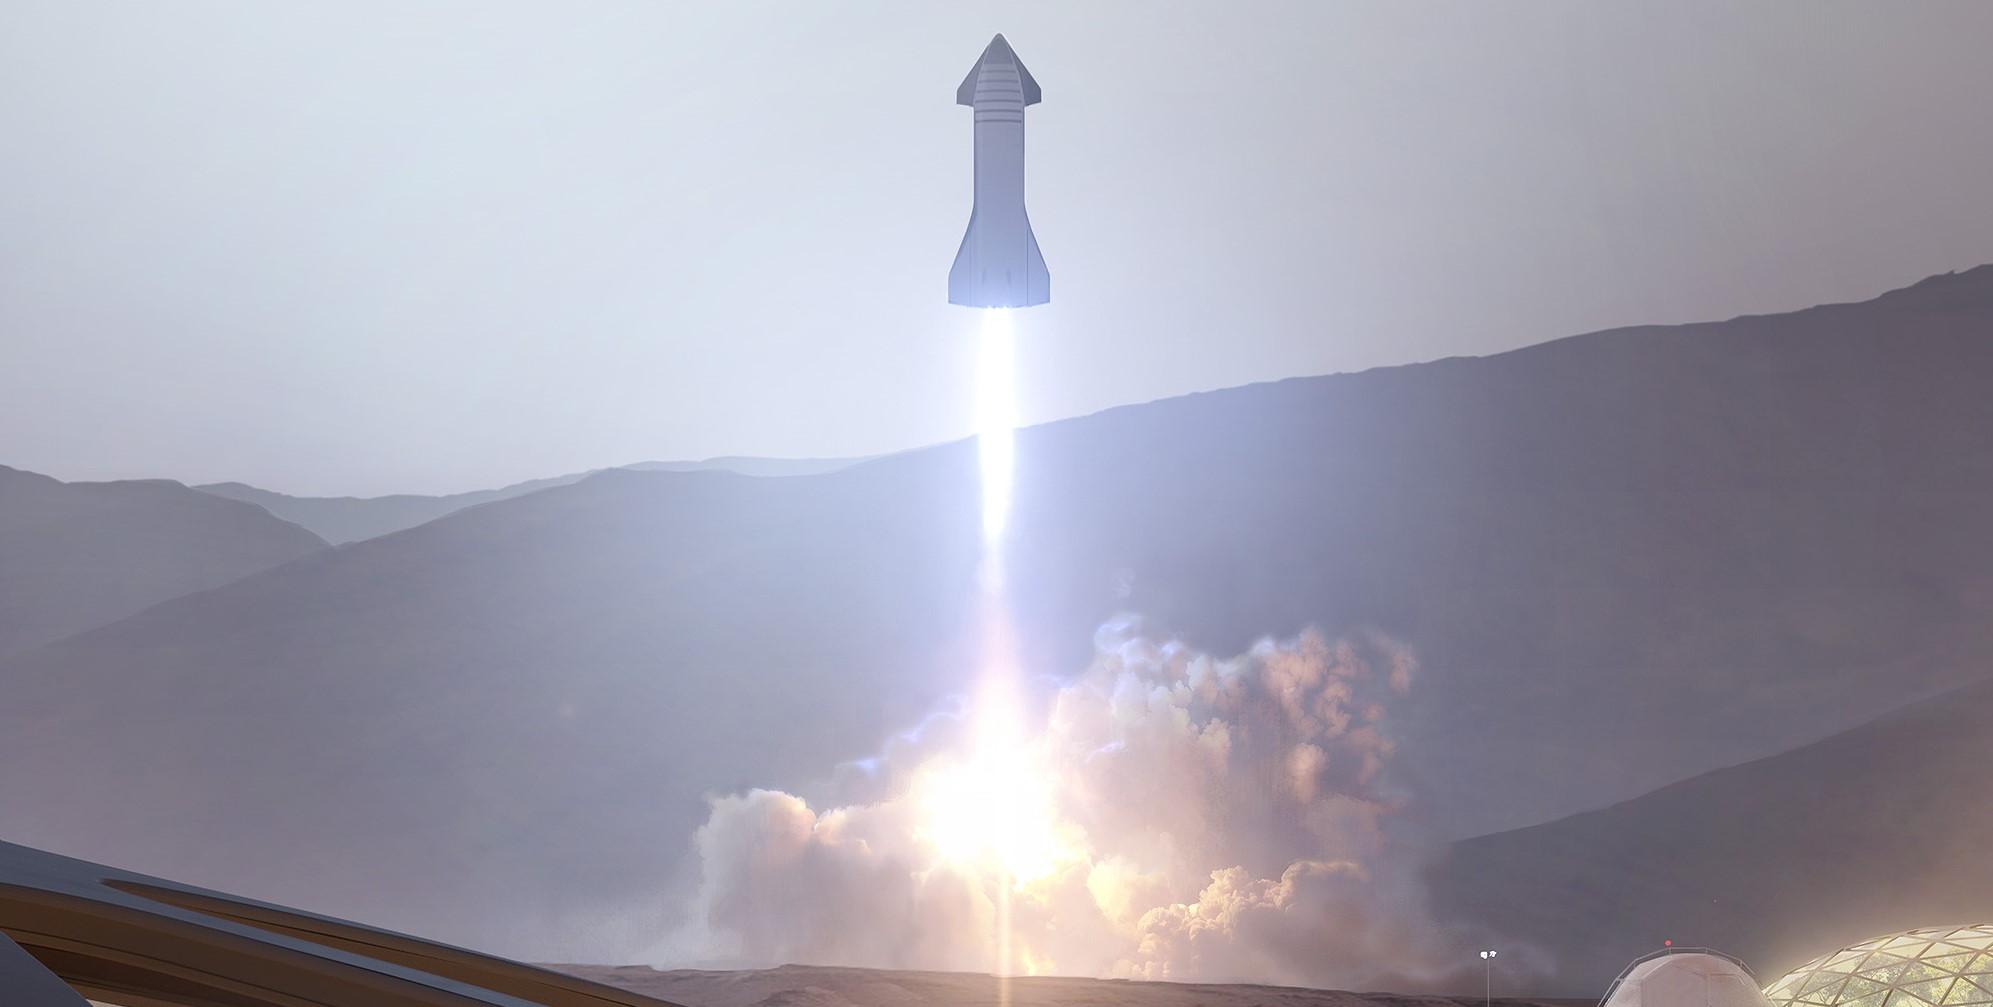 Starship 2019 Mars base interior render (SpaceX) 1 crop